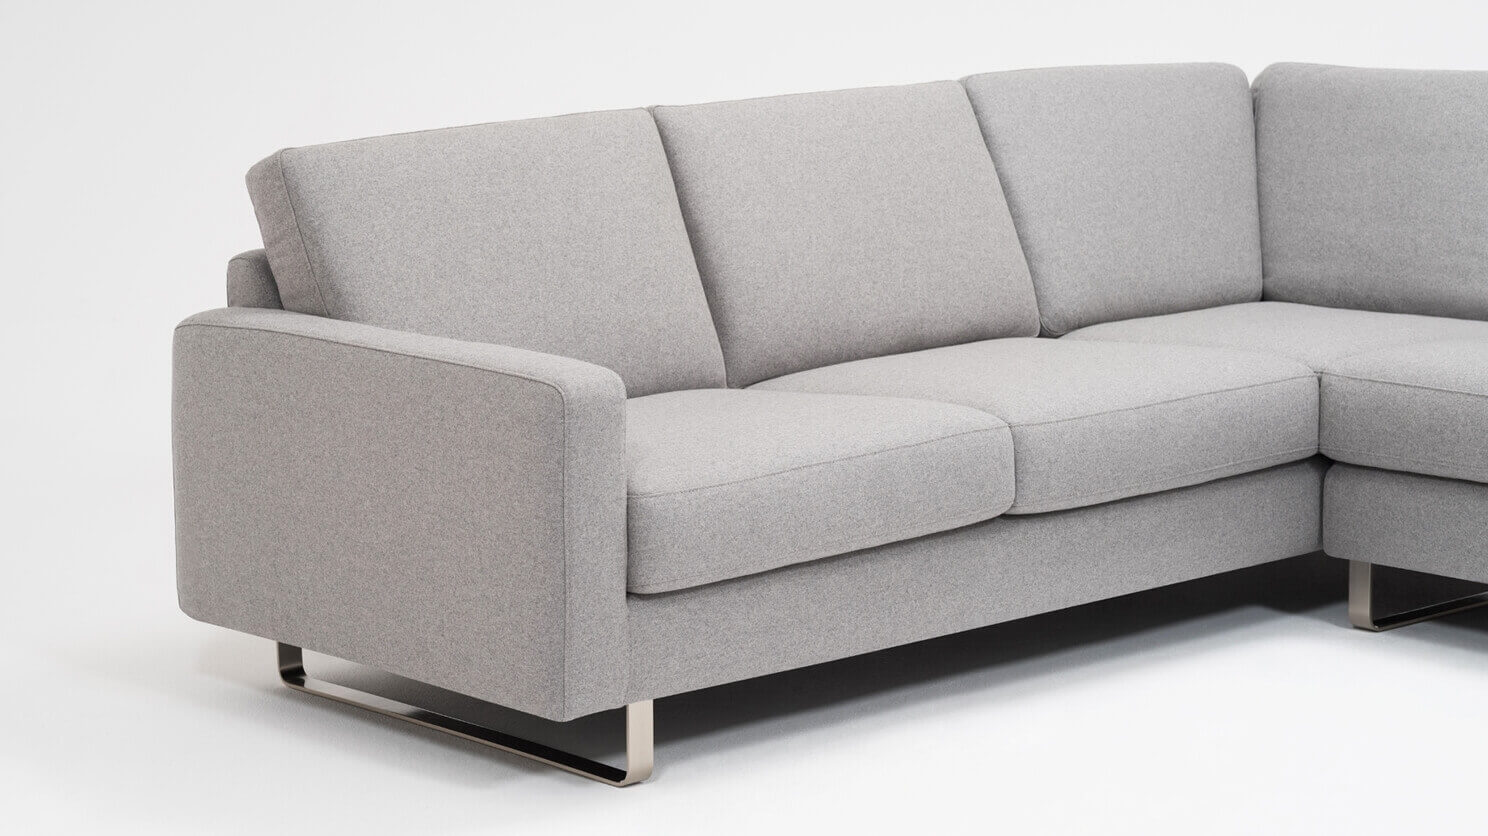 Oskar 2-Piece Sectional Sofa with Headrests